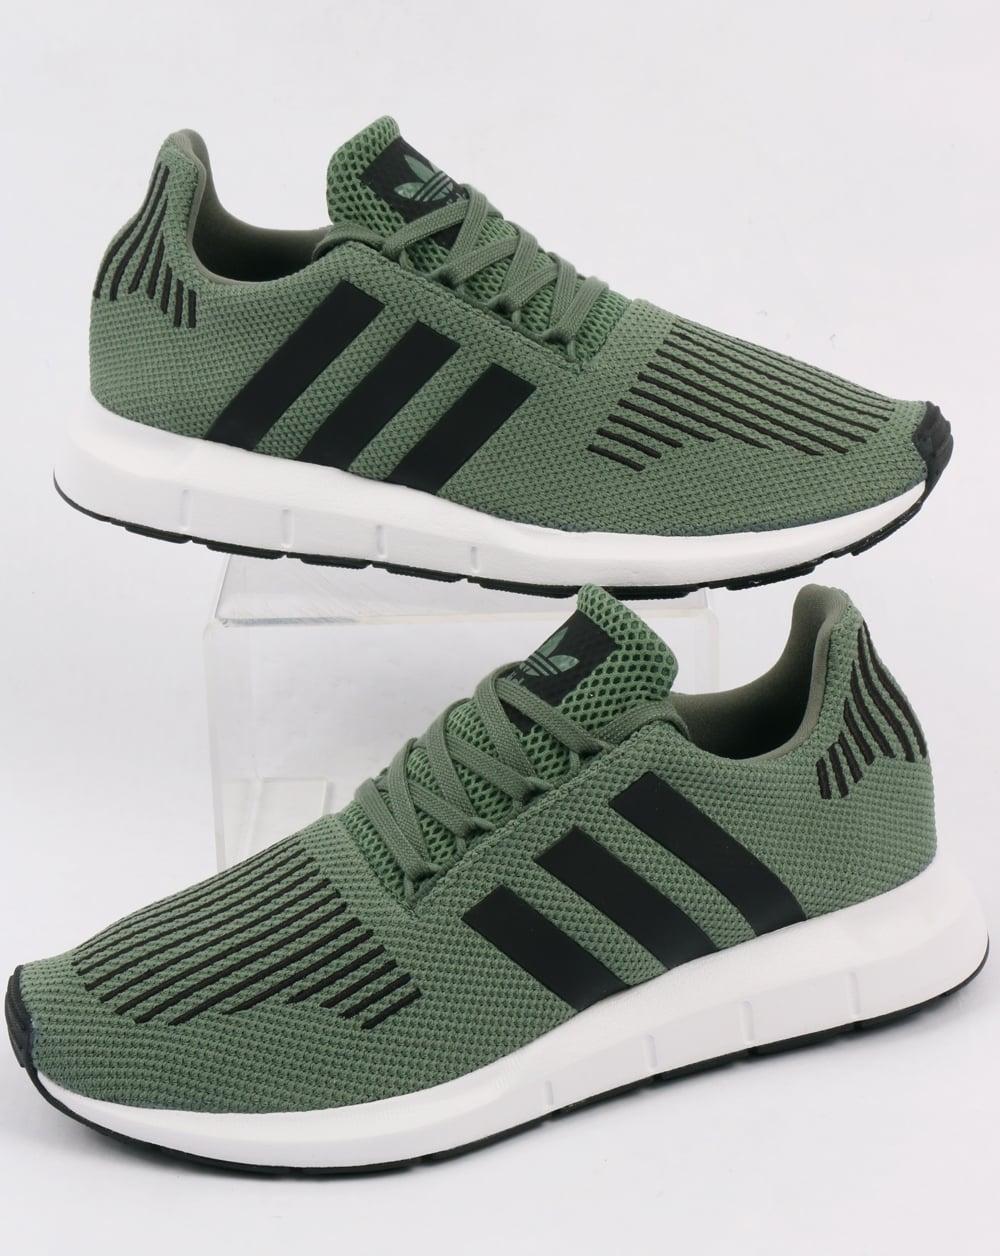 Adidas Swift Run Trainers Trace Green